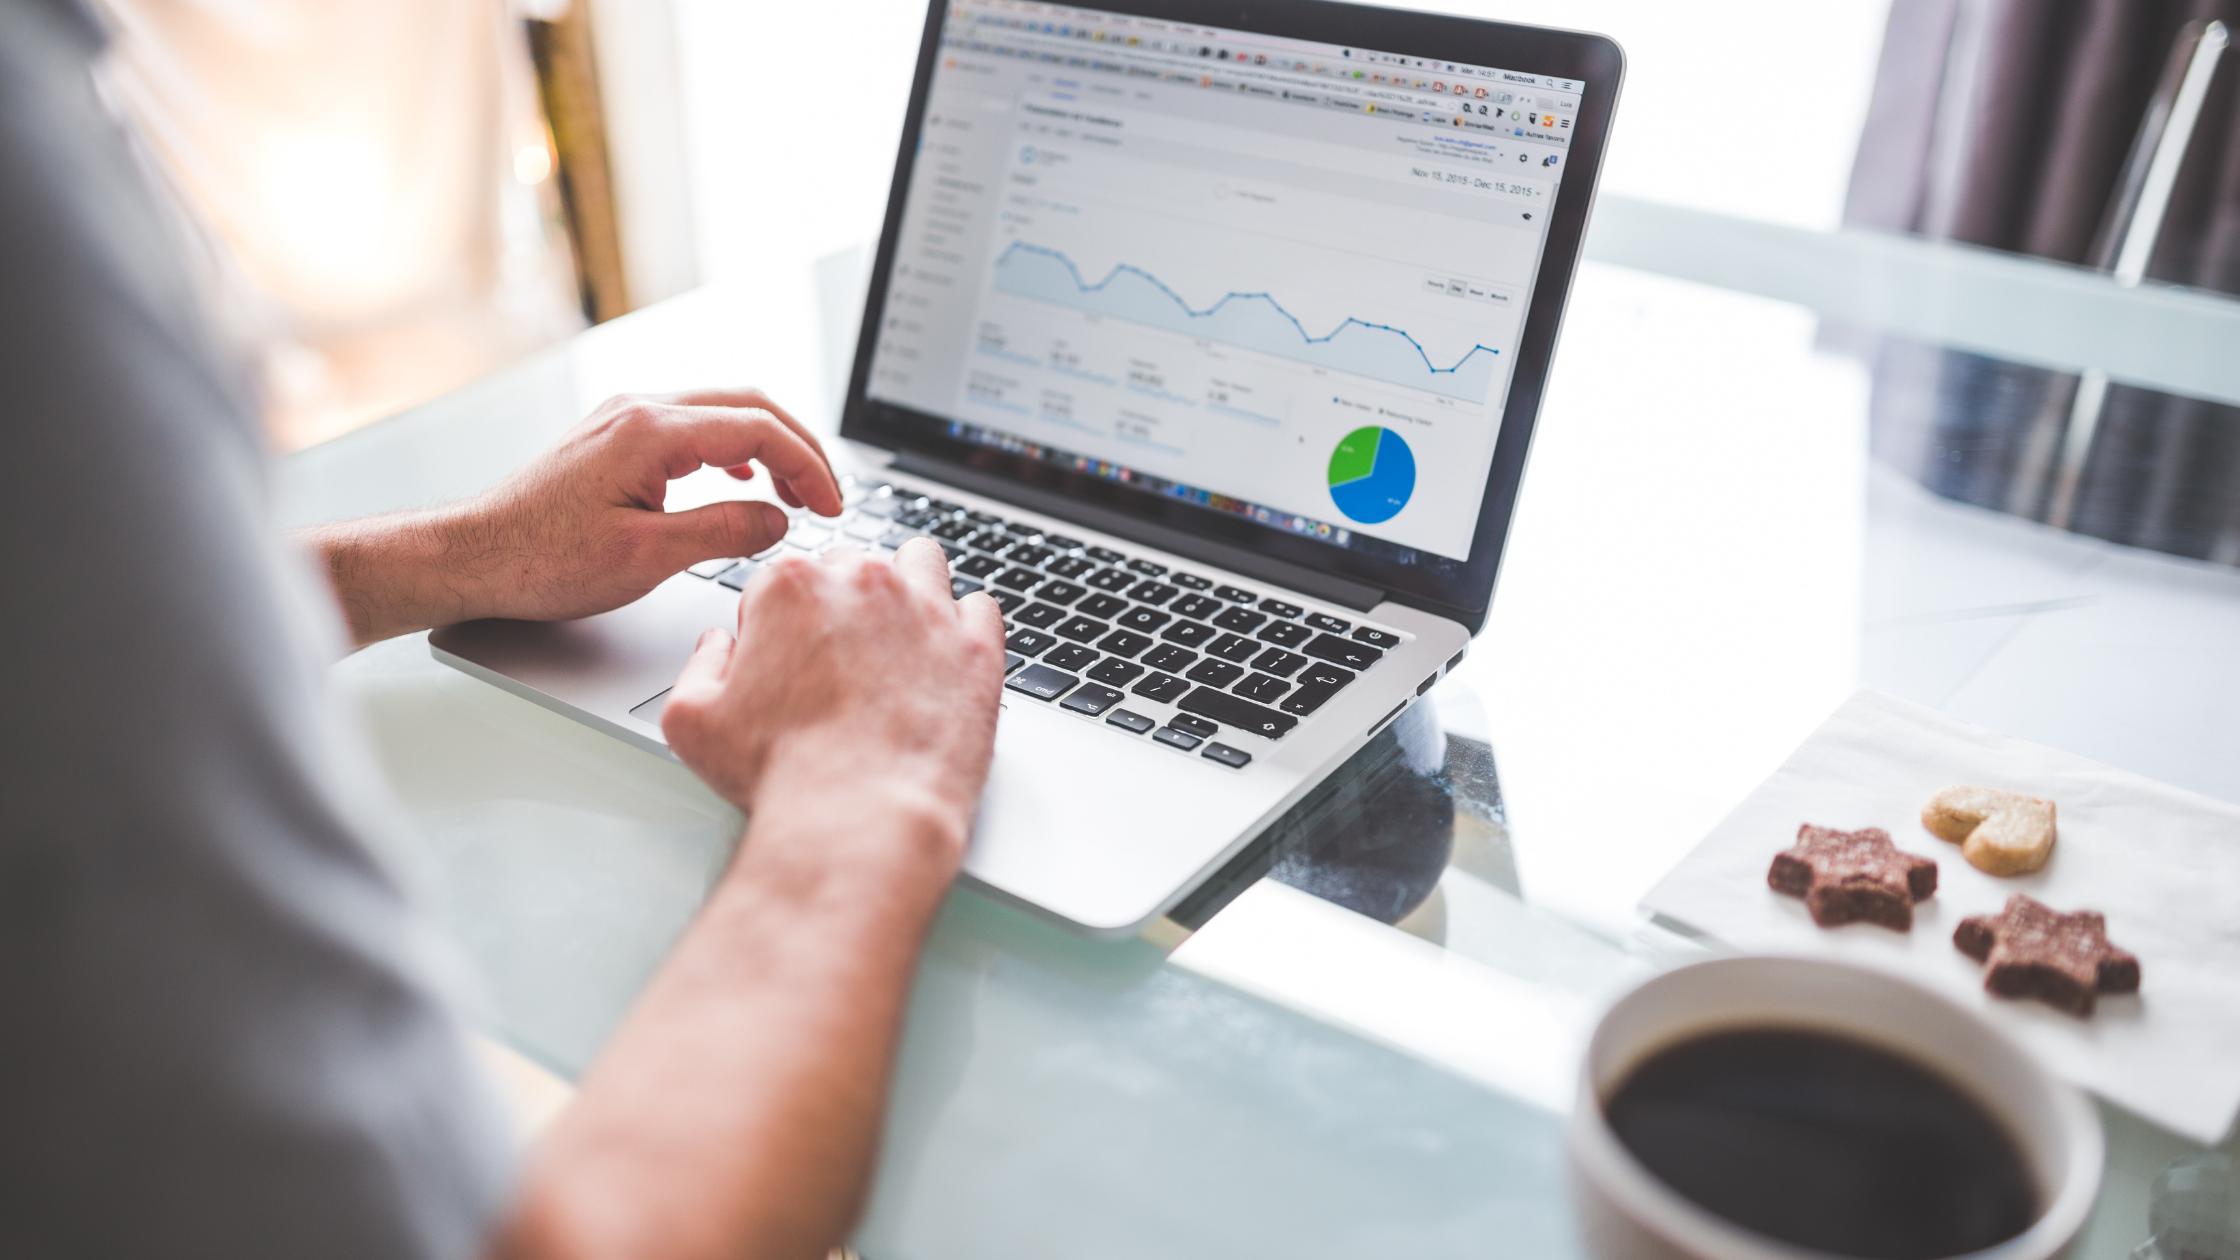 Digital marketing trends to watch in 2015